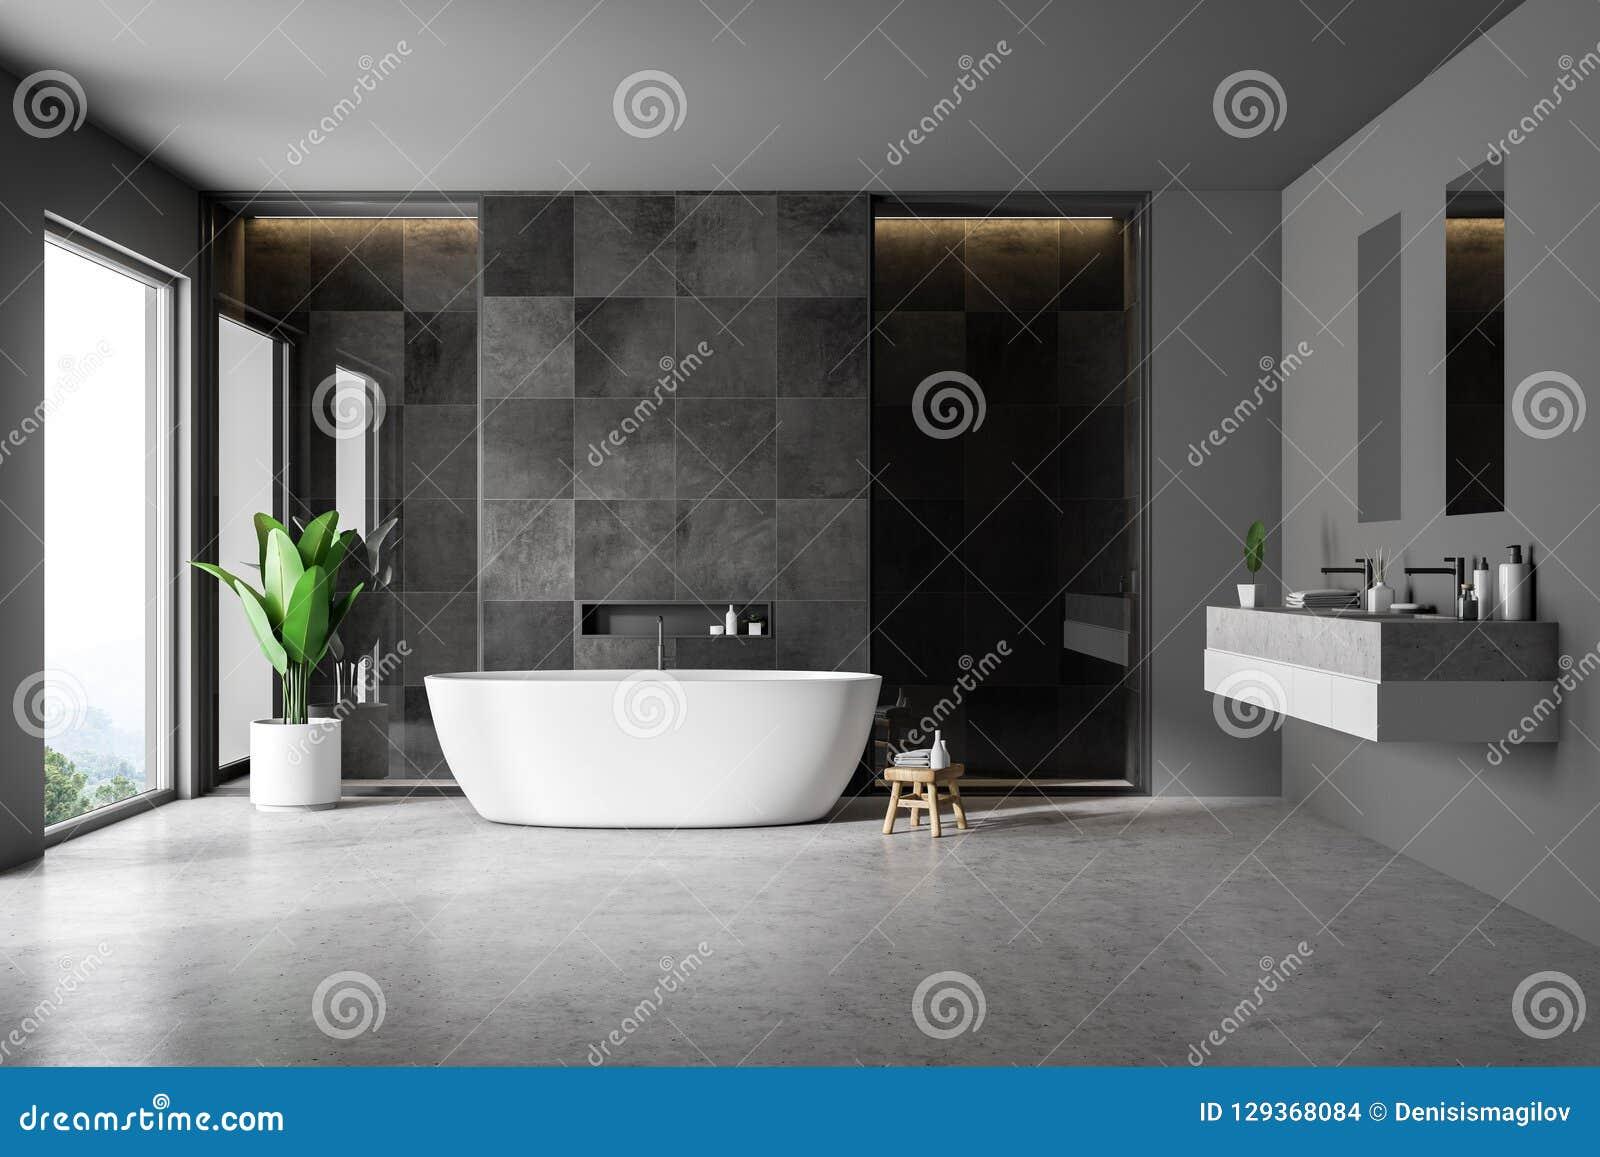 Black Tile Bathrom Interior Tub And Sink Stock Illustration